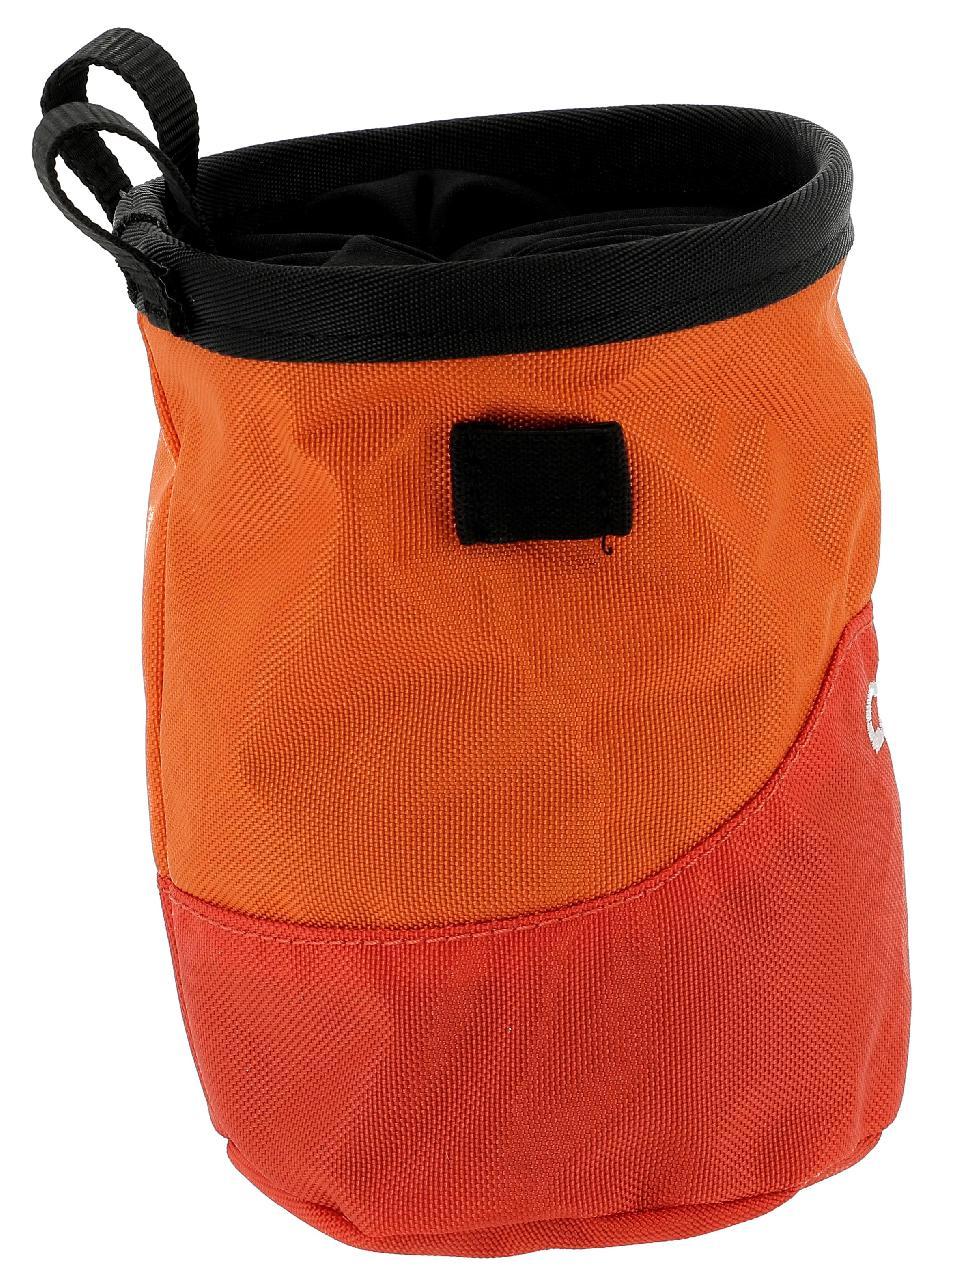 Sac-a-pof-Camp-Acqualong-org-sac-pof-Orange-15010-Neuf miniature 3